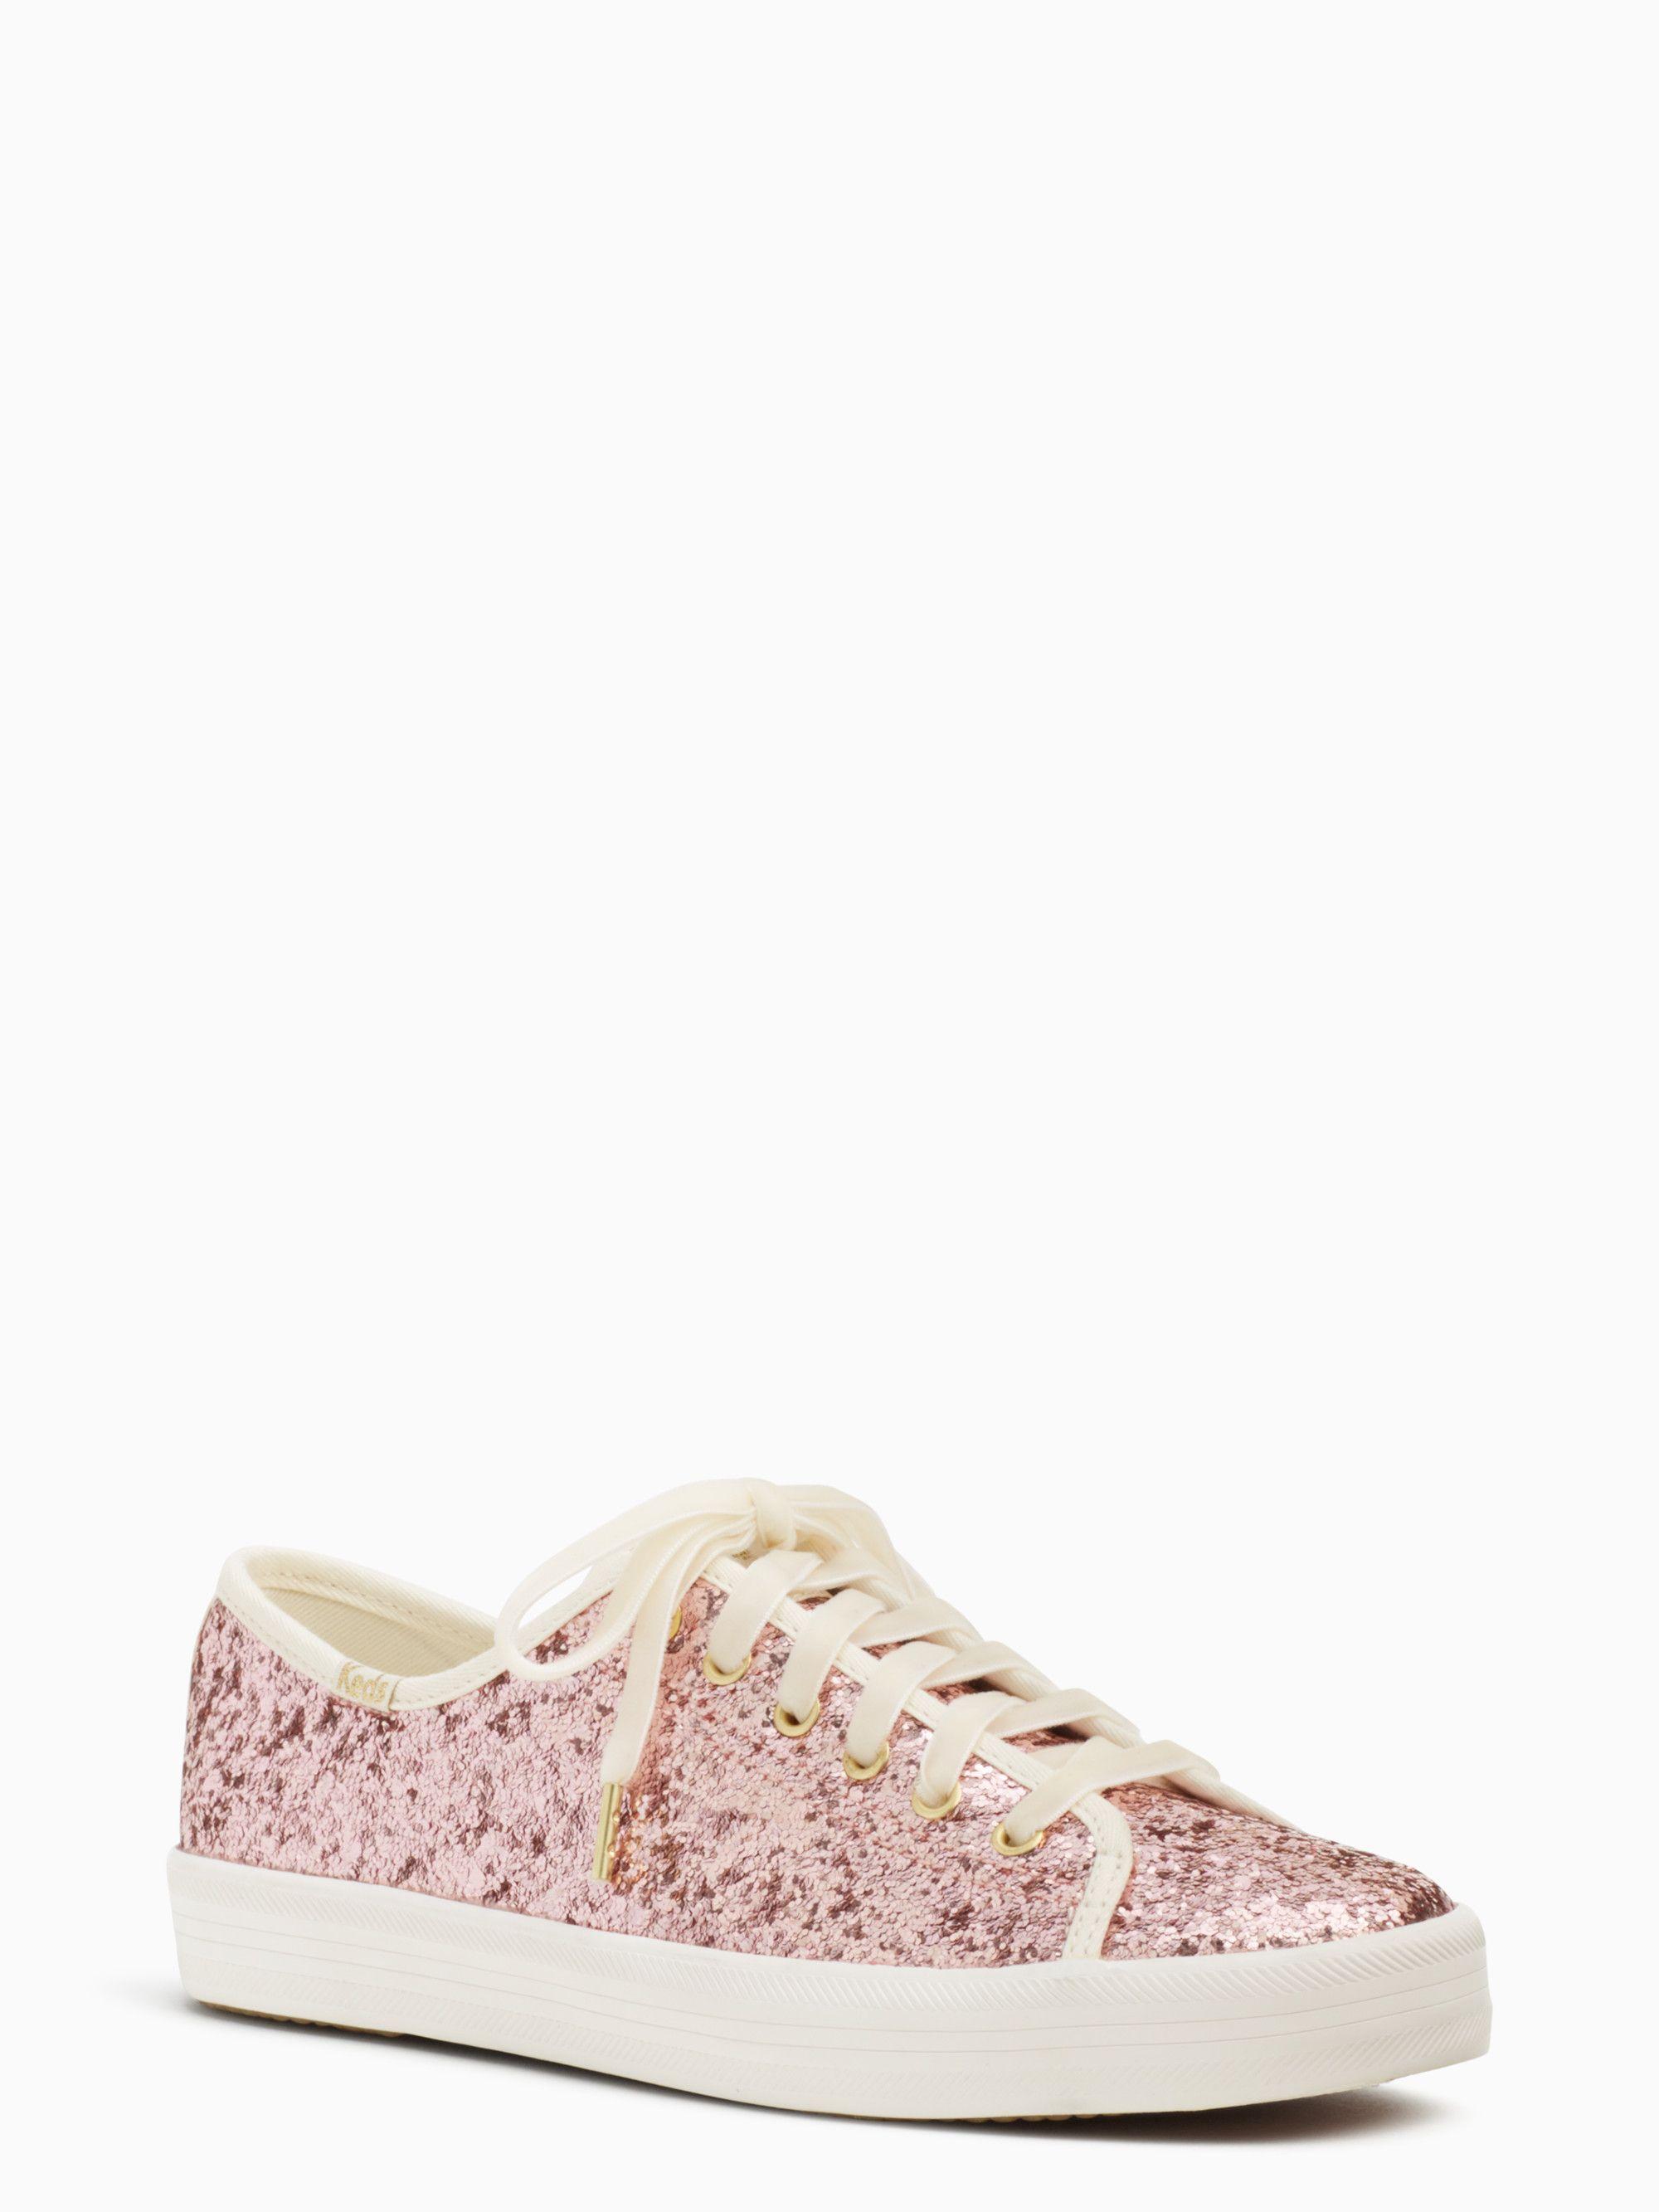 Pink sparkle shoes, Kate spade keds